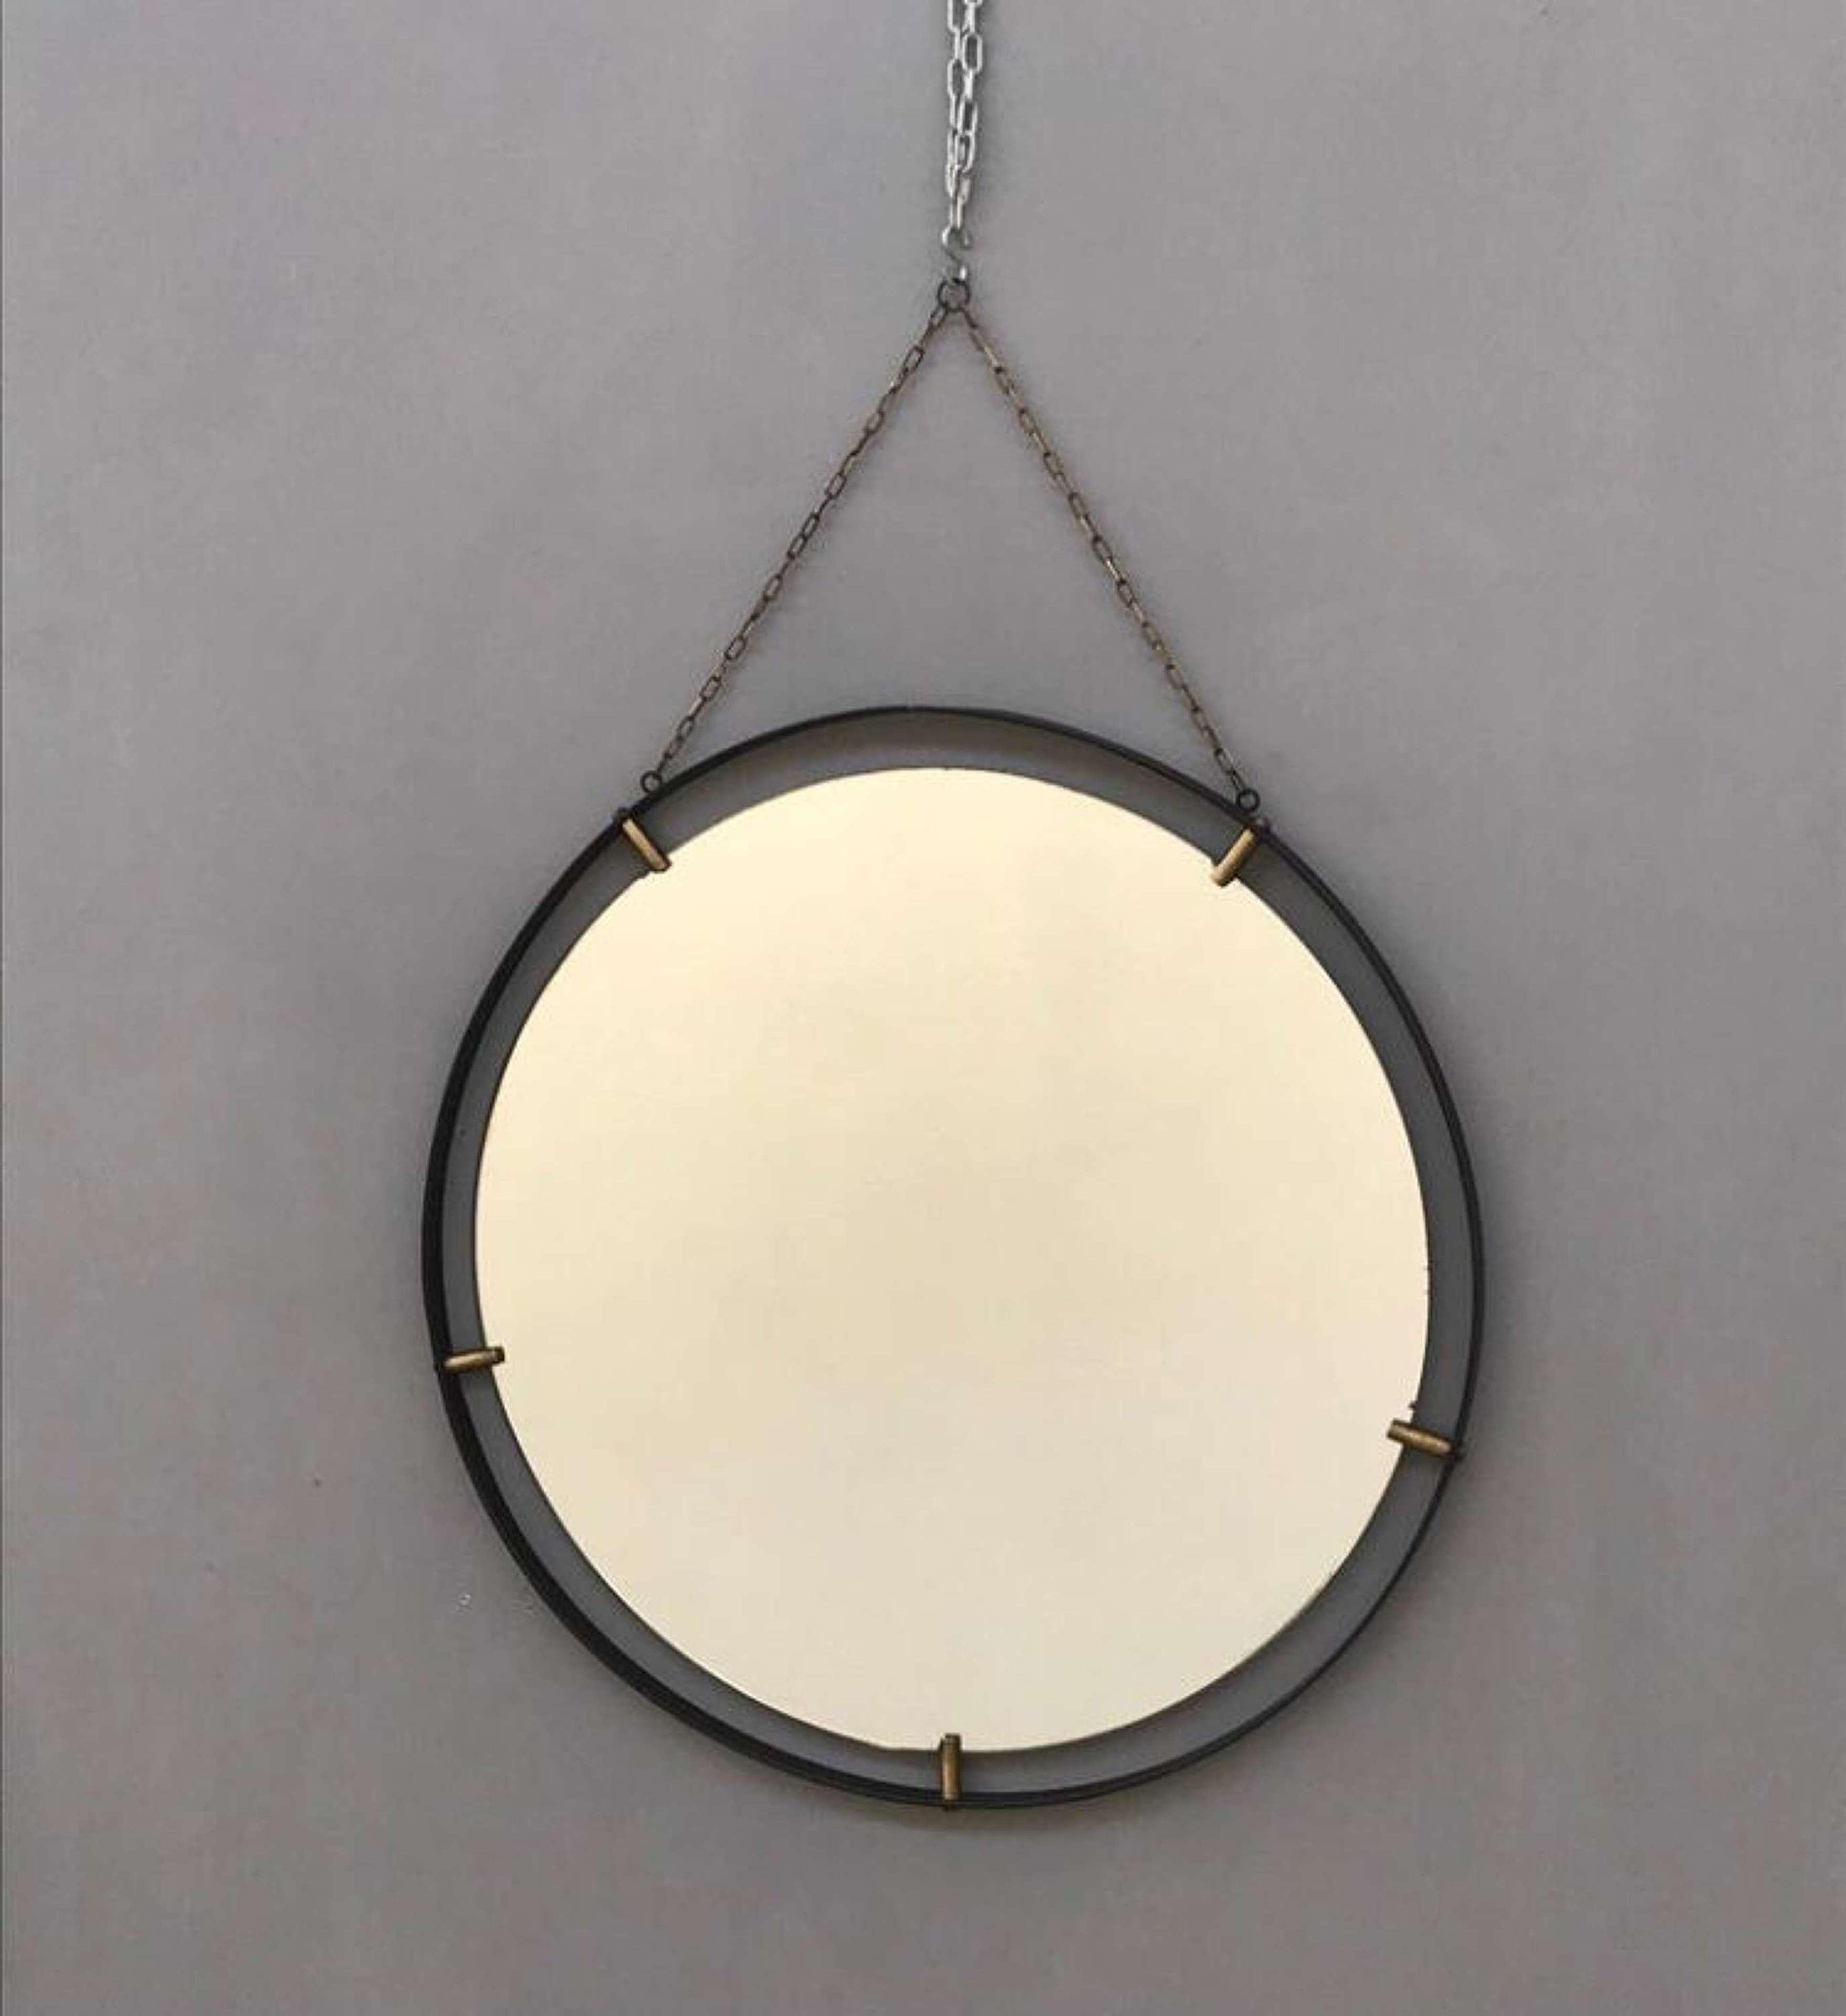 Pair of Italian 60s Metal & Brass Round Mirrors